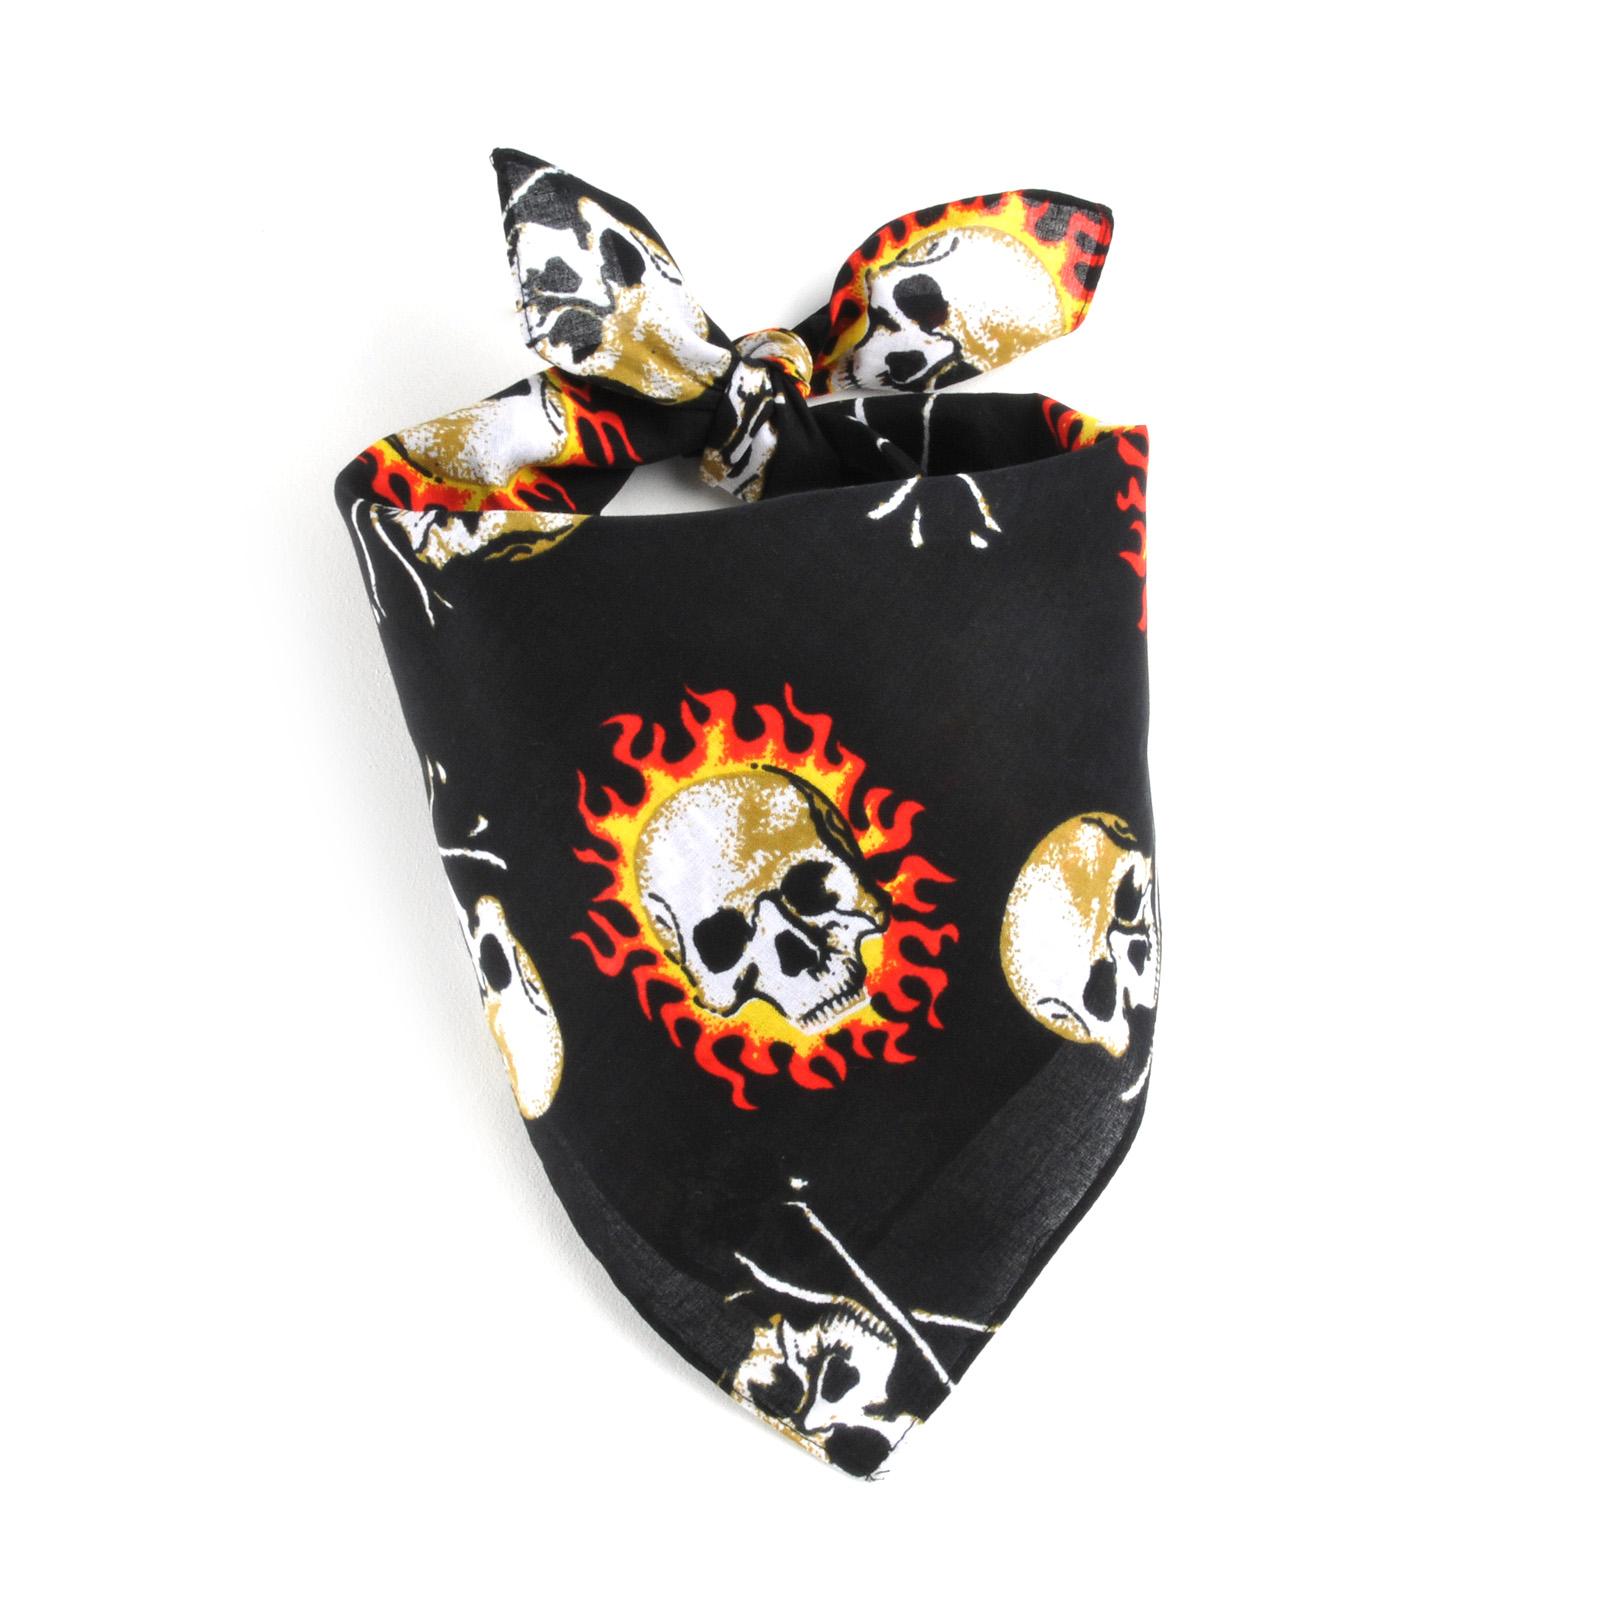 foulard-bandana-noir-cranes-AT-01928--F16